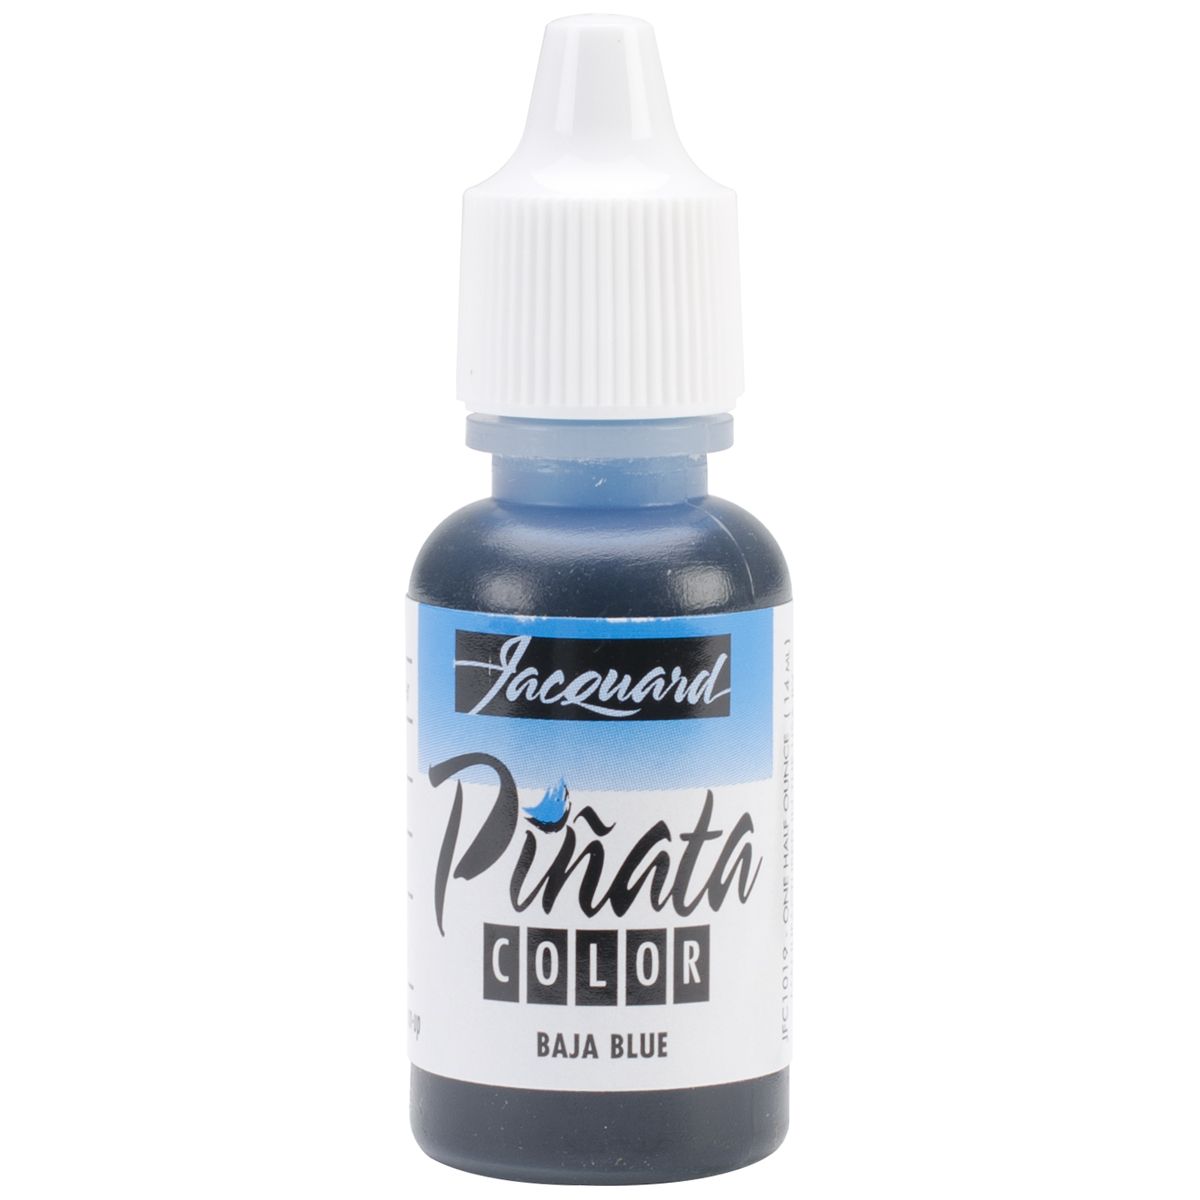 Jacquard Pinata Color Alcohol Ink .5oz-Baja Blue